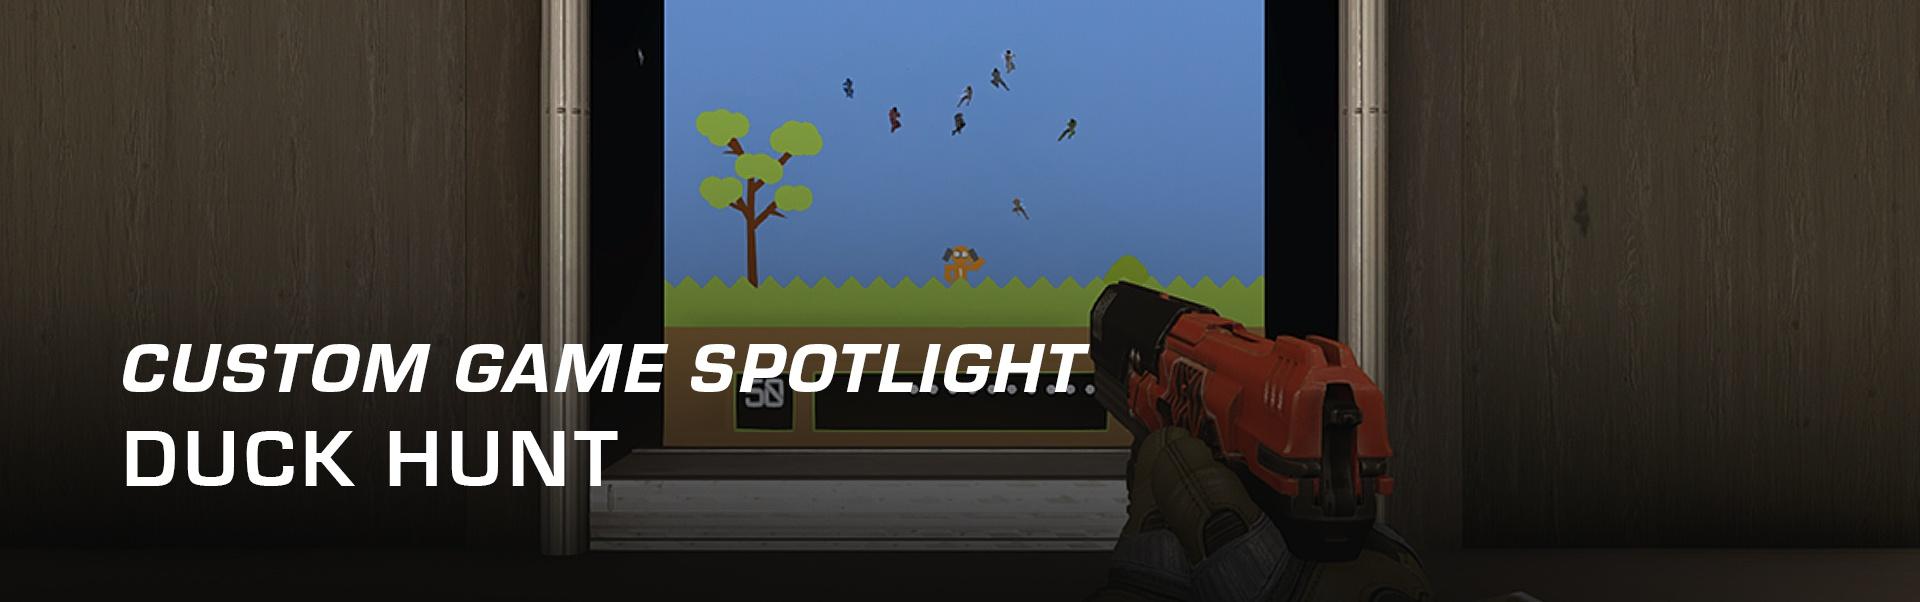 custom_game_spotlight_-_duck_hunt.jpg